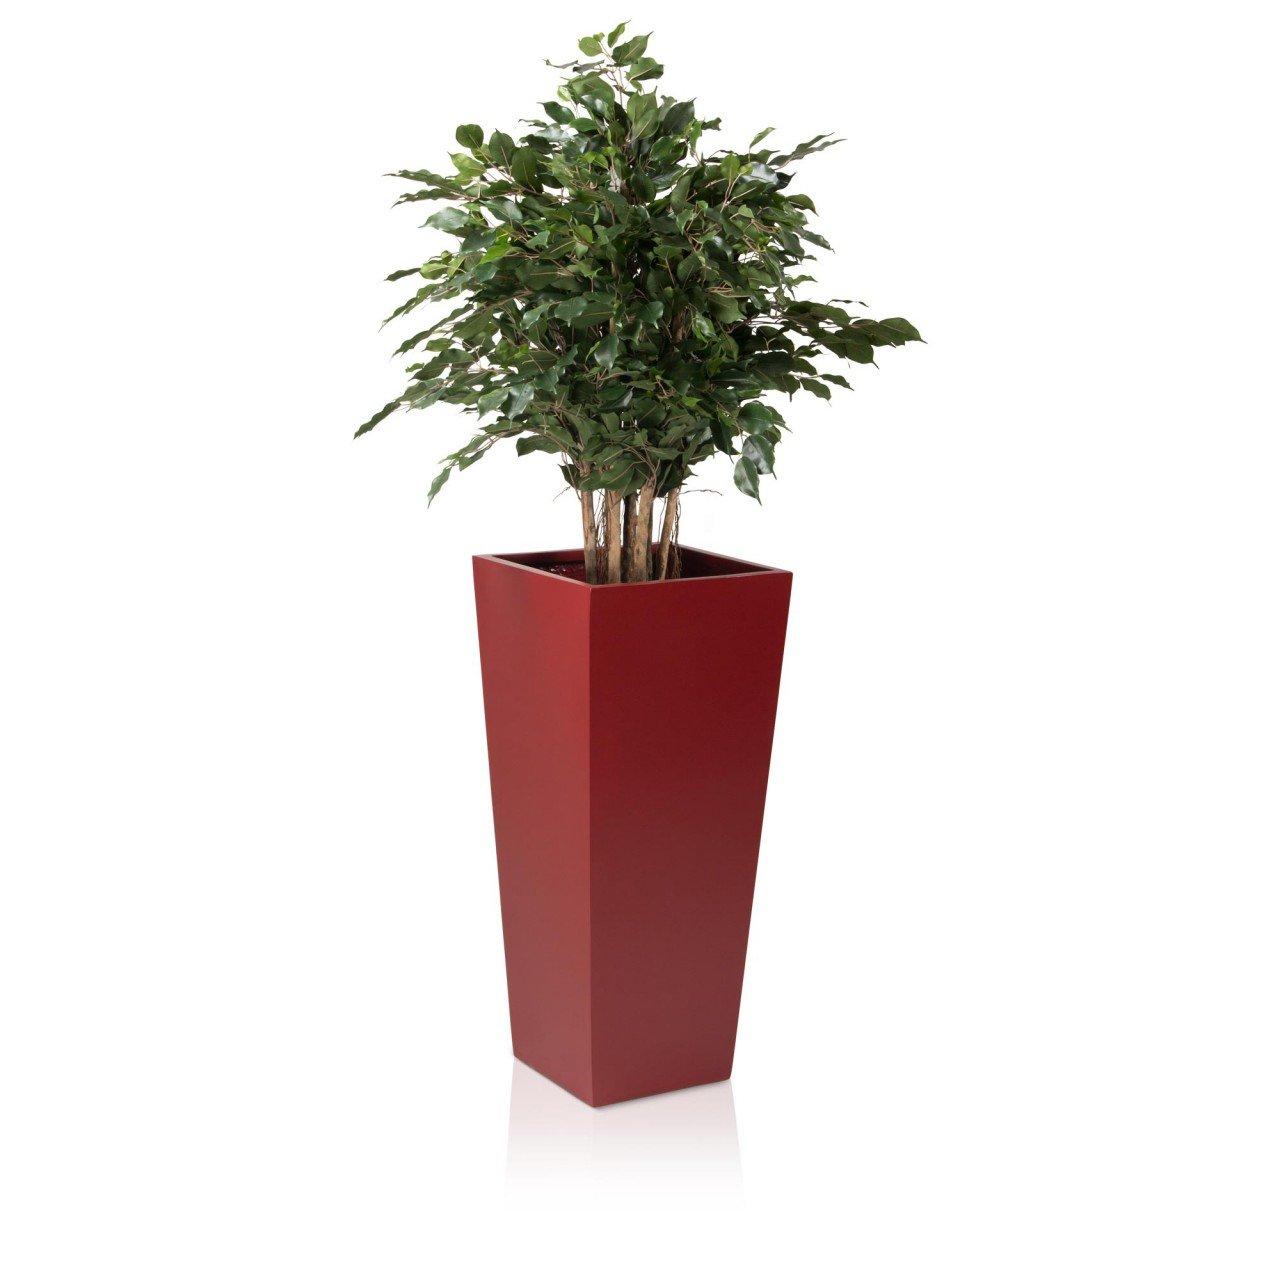 pflanzk bel blumenk bel cono plaza fiberglas rot matt hoher premium pflanztopf jetzt kaufen. Black Bedroom Furniture Sets. Home Design Ideas